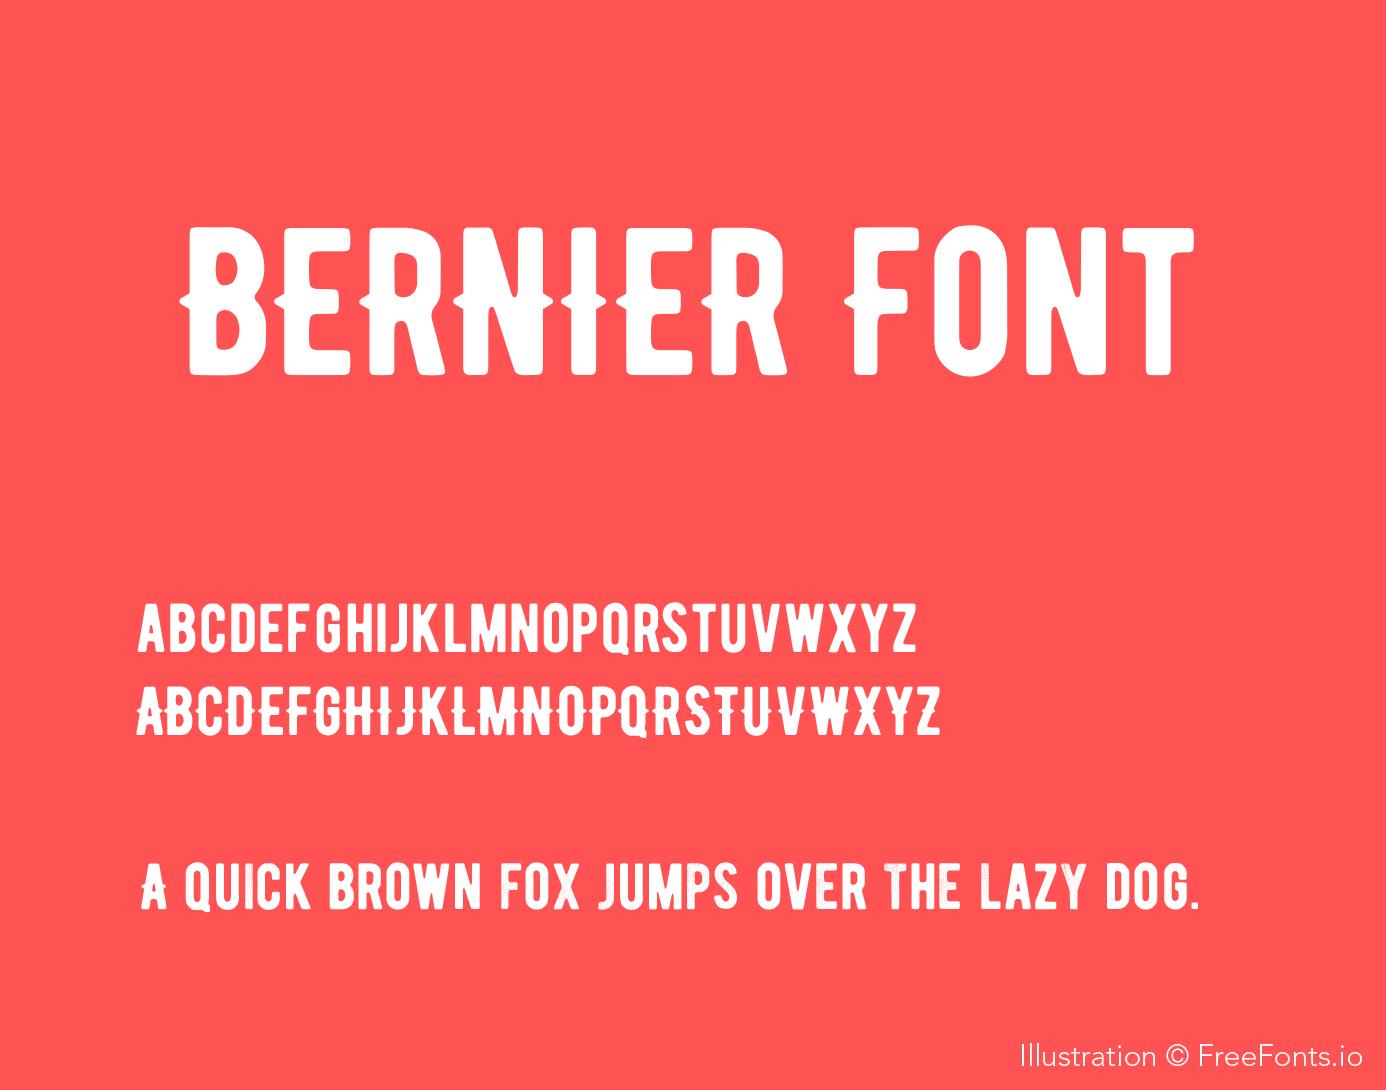 https://fontclarity.com/wp-content/uploads/2019/09/bernier-font-download-0.png Free Download